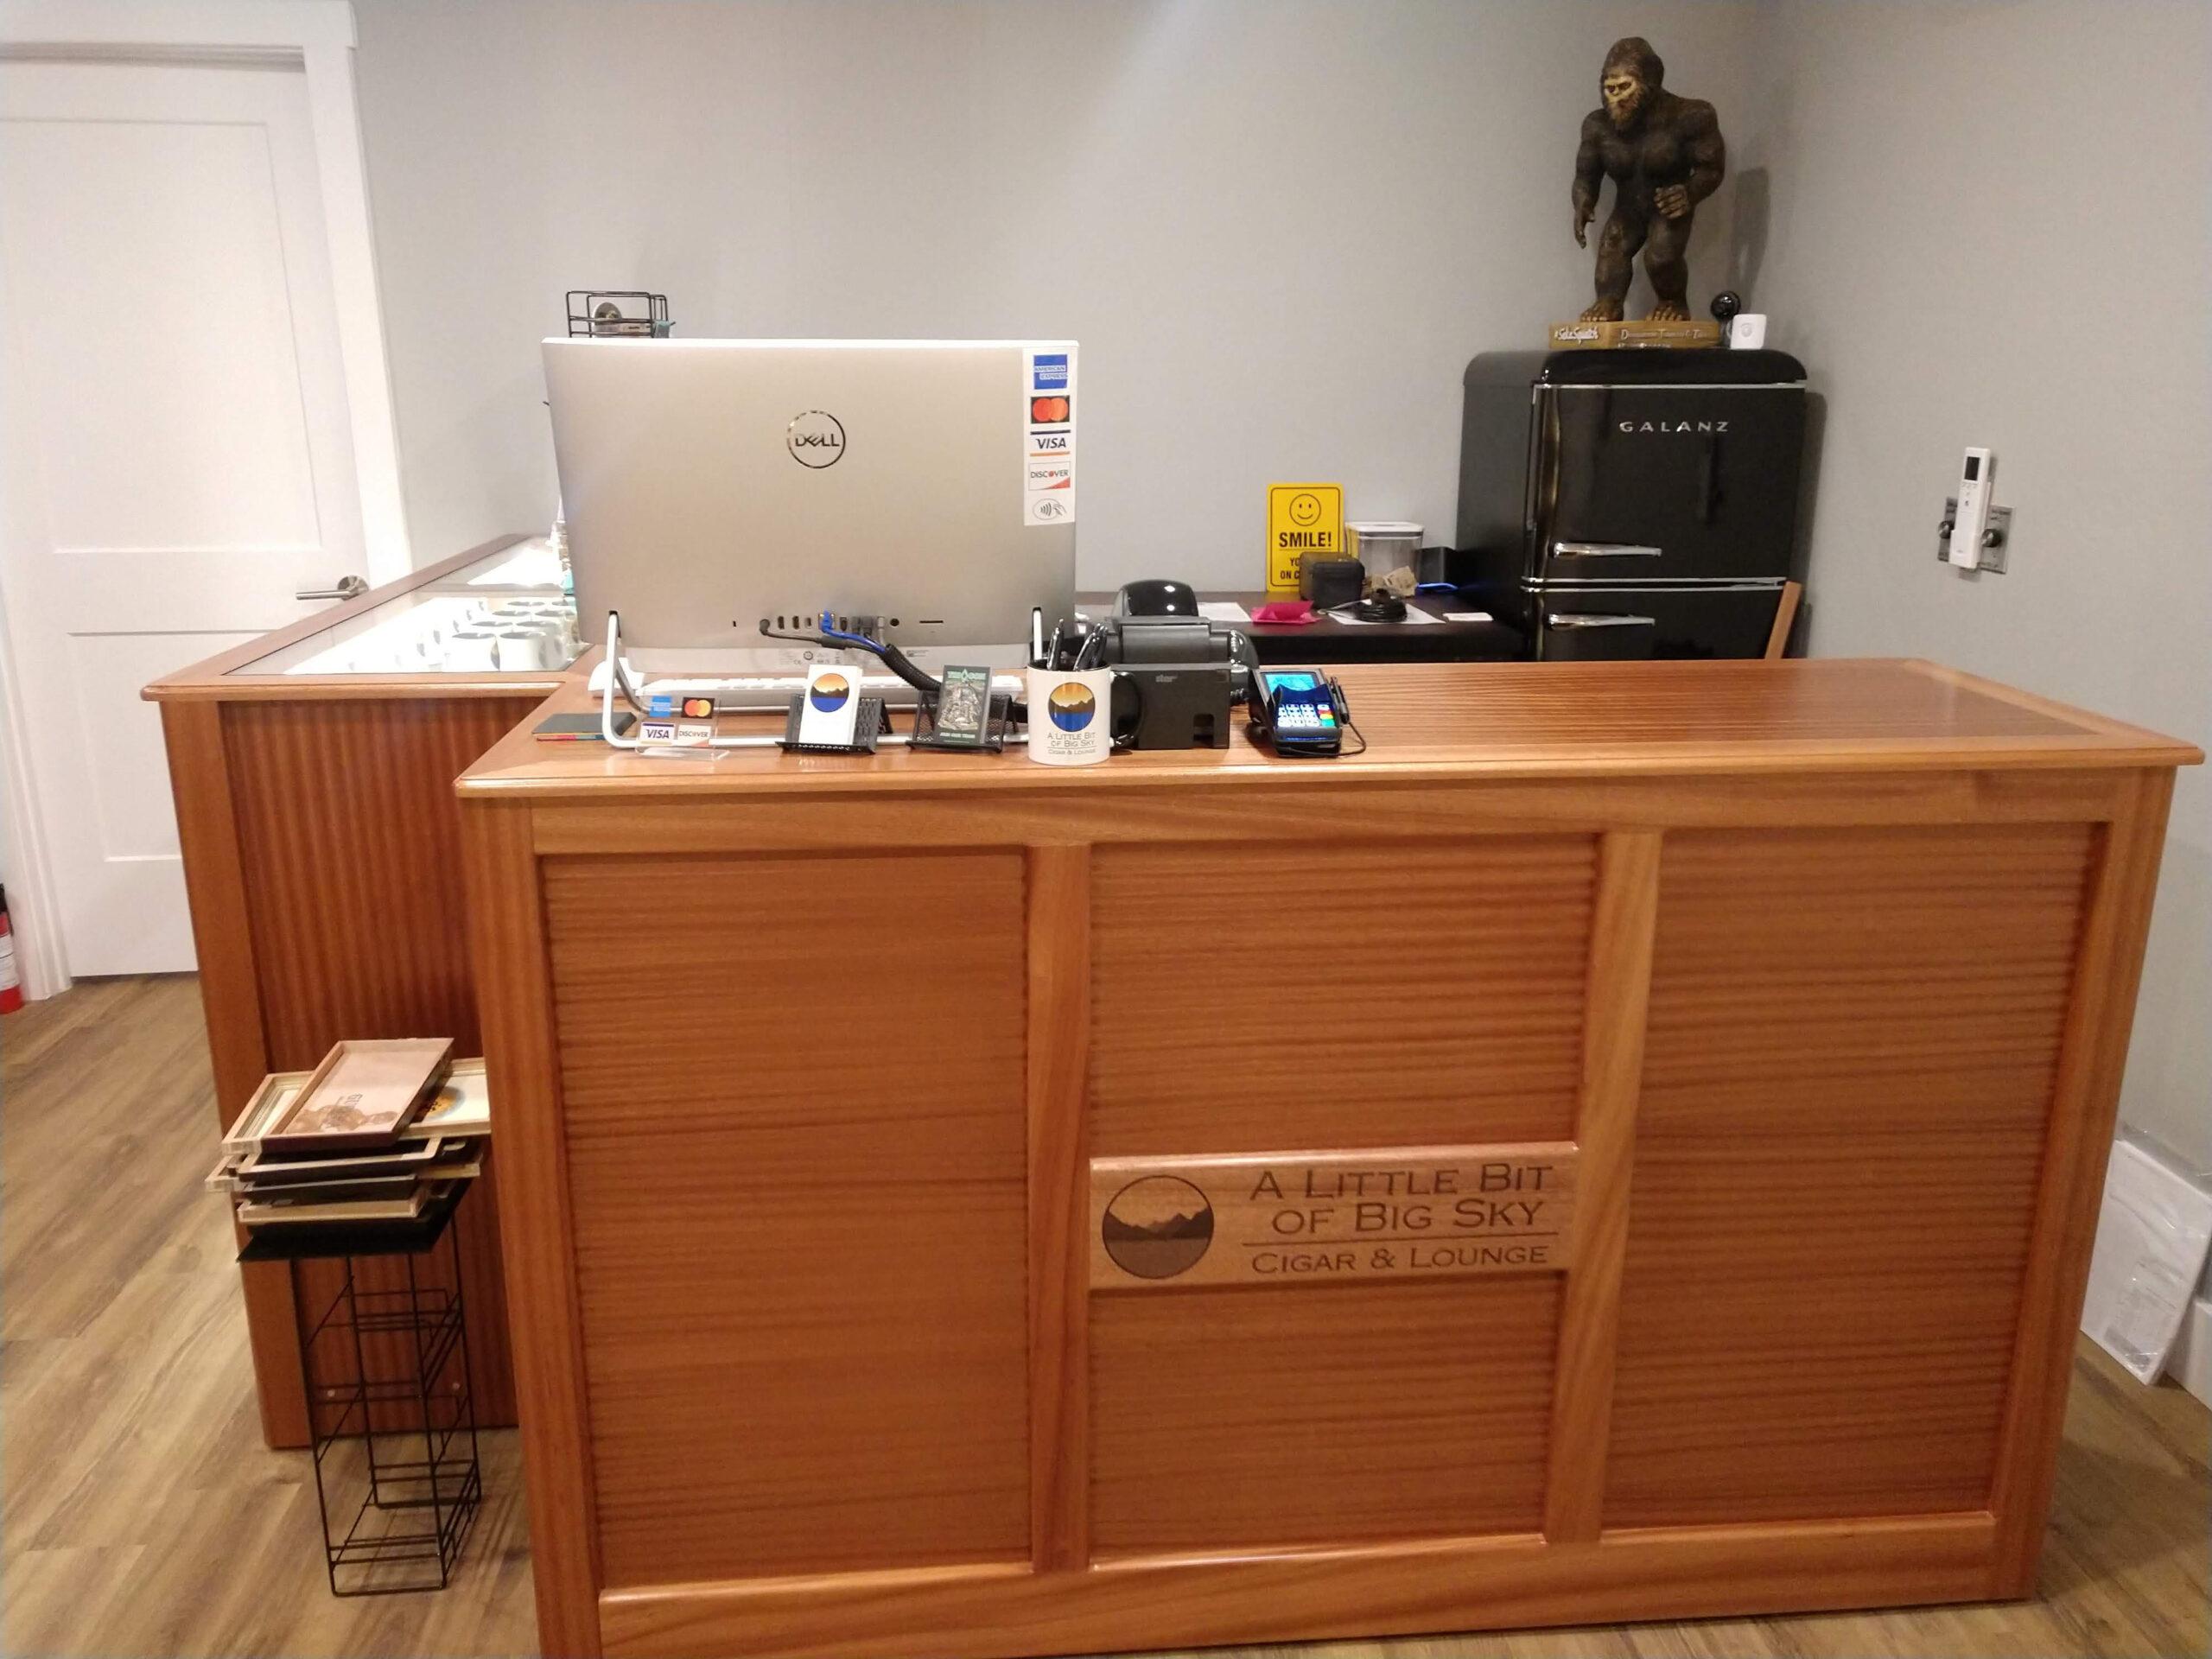 A Little Bit of Big Sky Cigar & Lounge – Kalispell, MT – Custom Counters